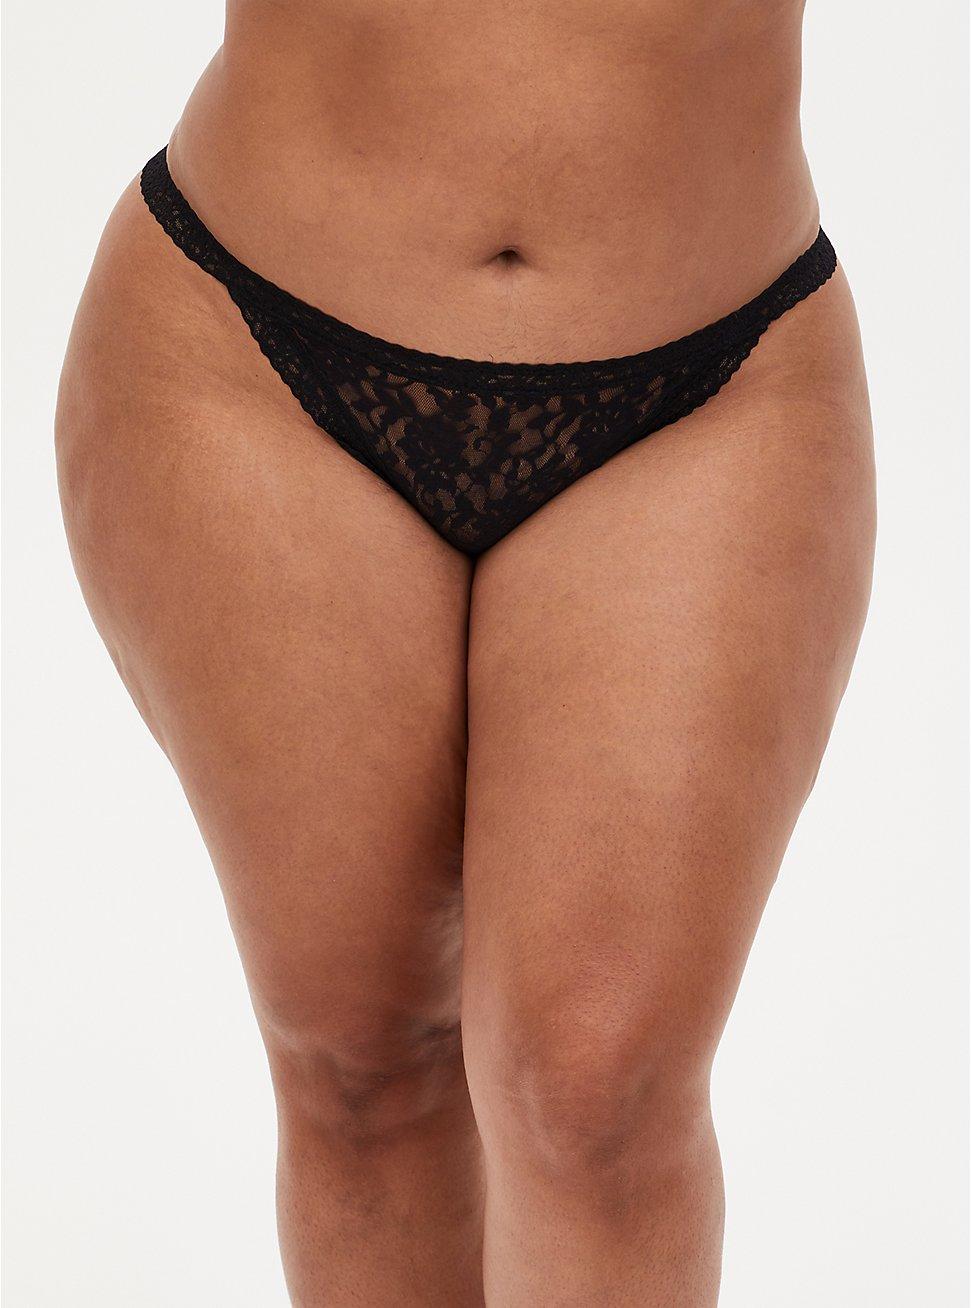 Black Lace G-String Panty , RICH BLACK, hi-res